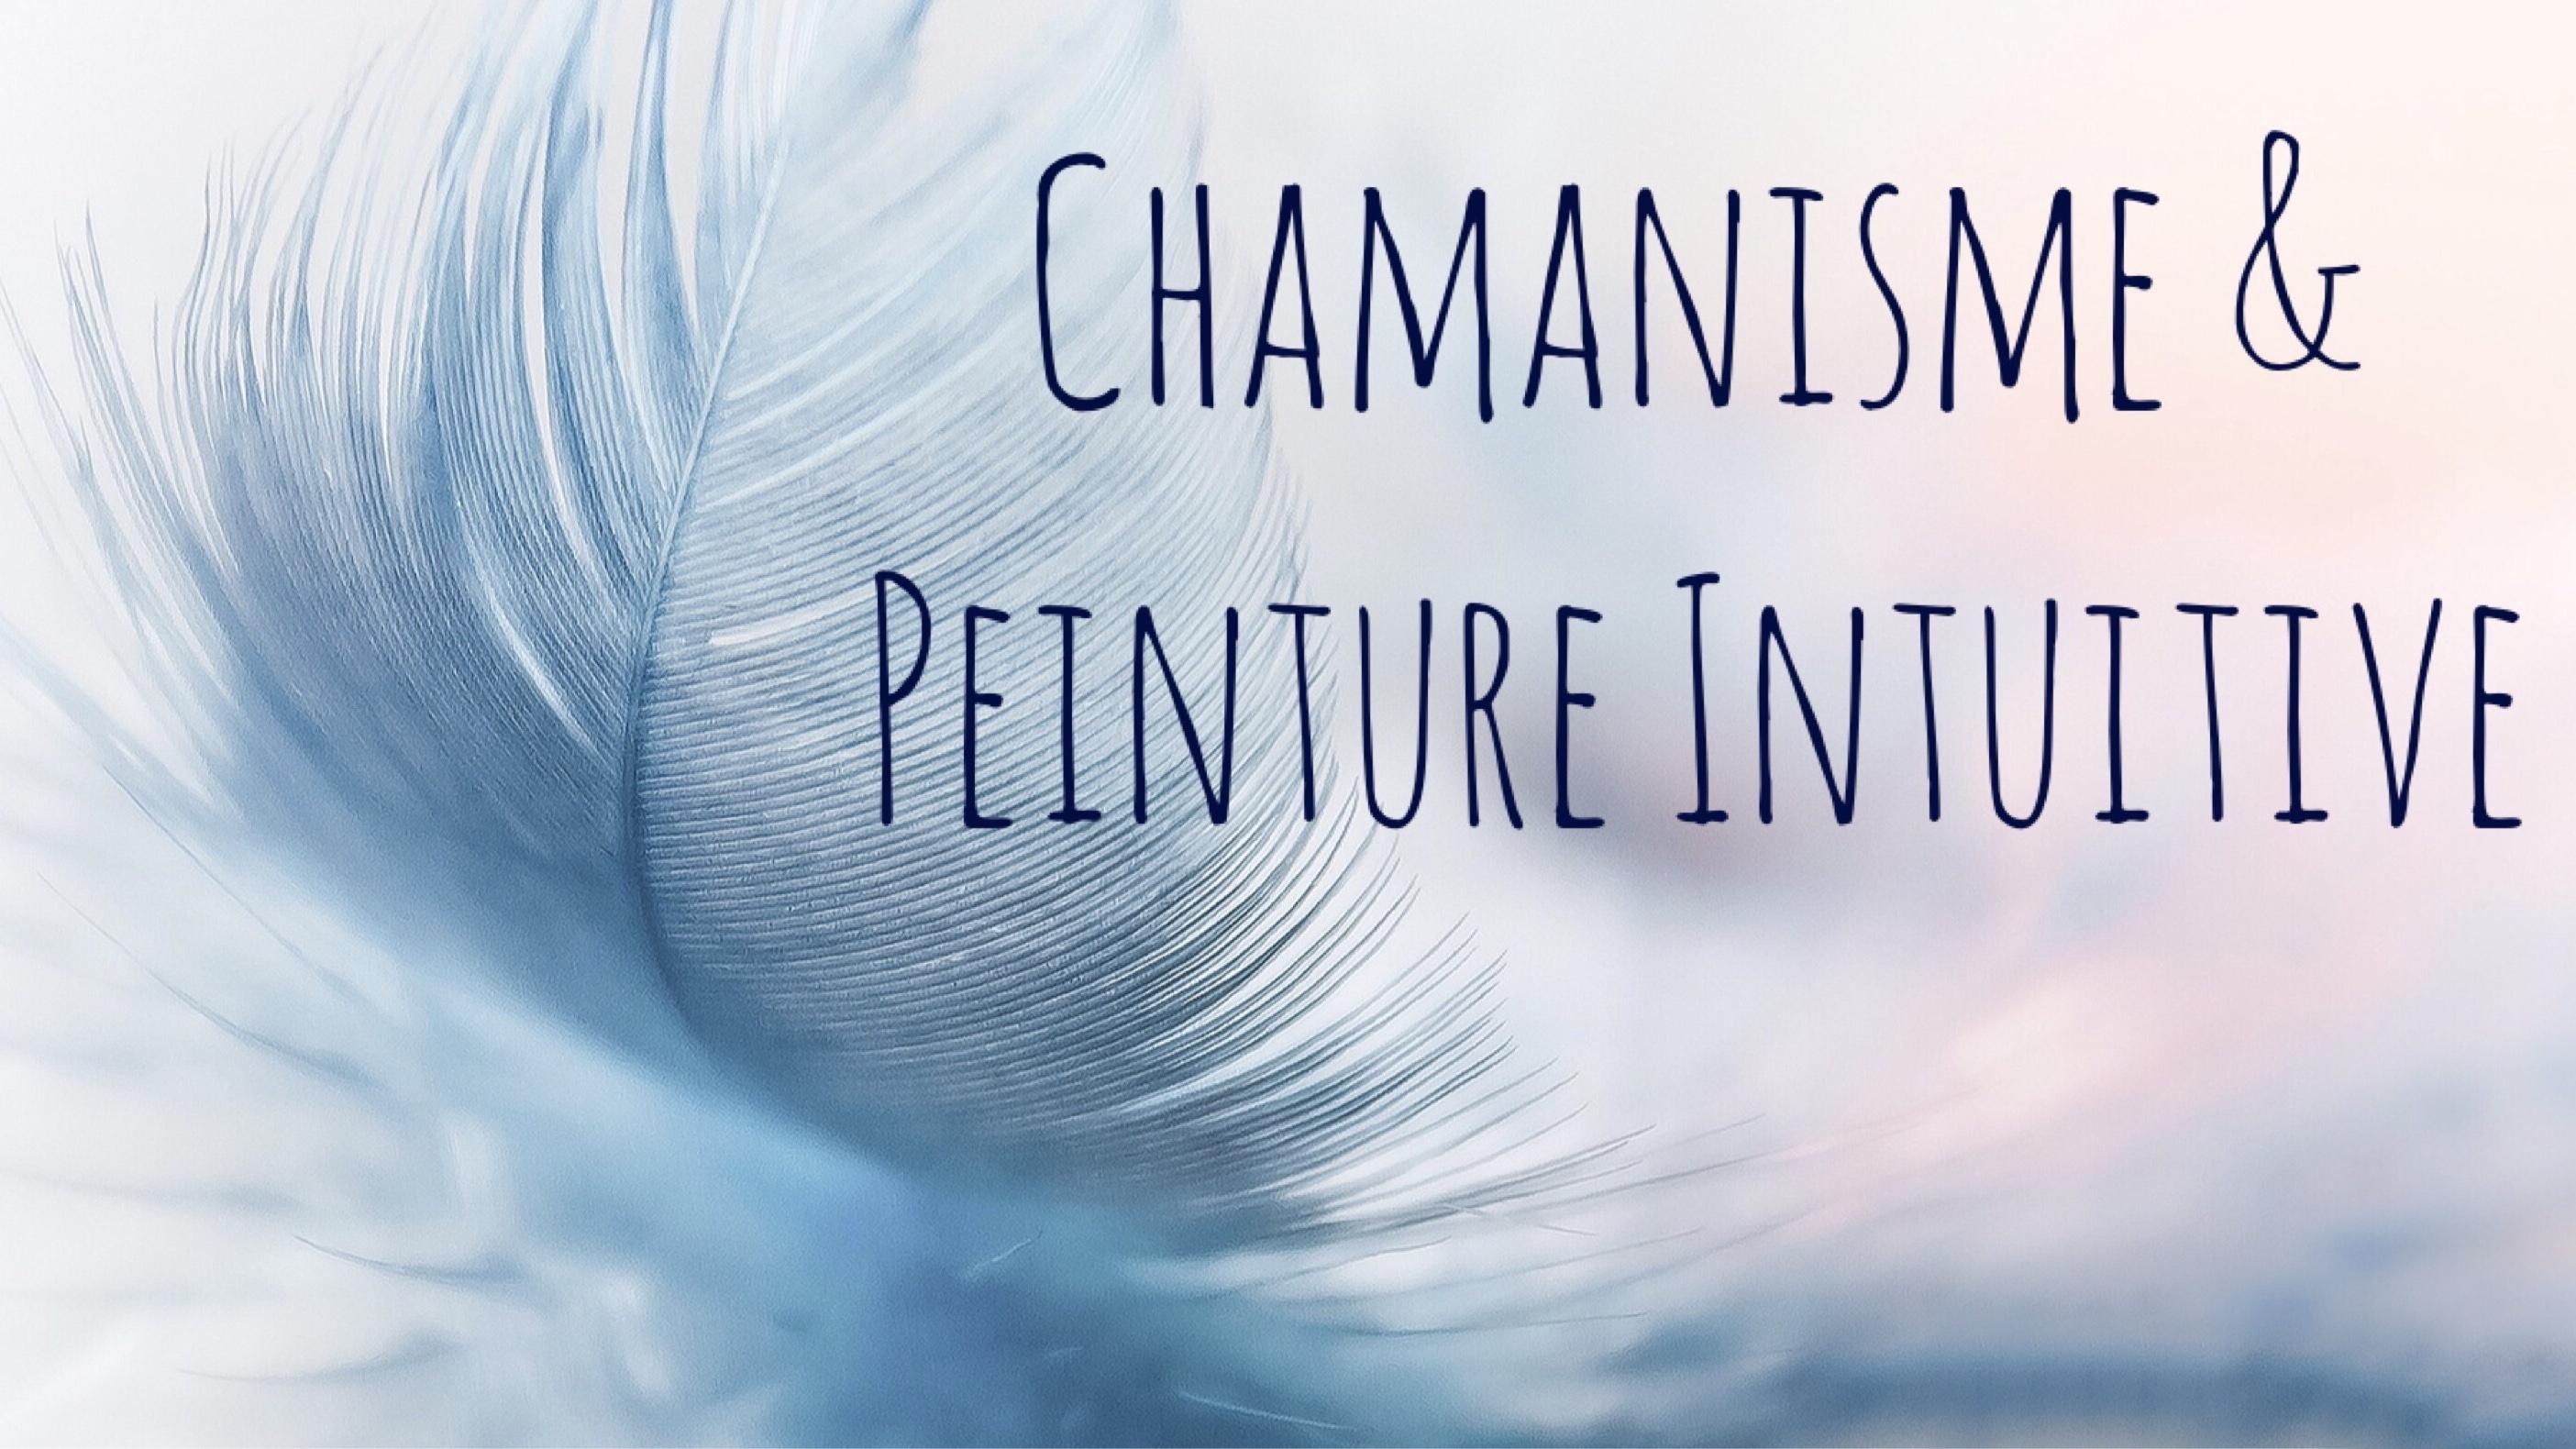 chamanisme-peinture-intuitive balma